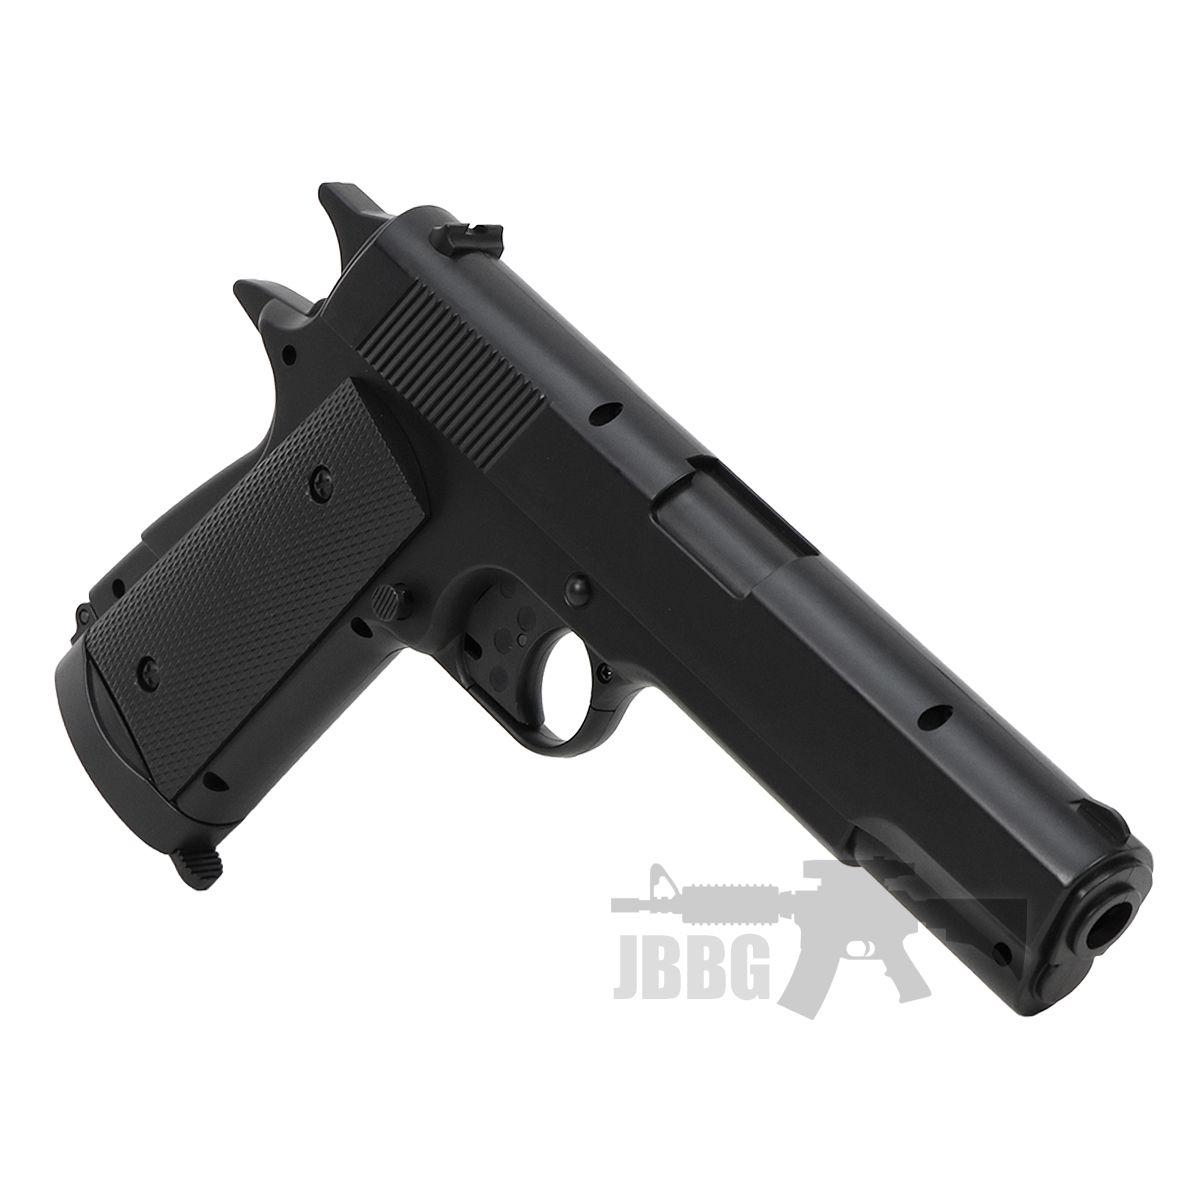 hgc312 airsoft gas pistol jbbg 3